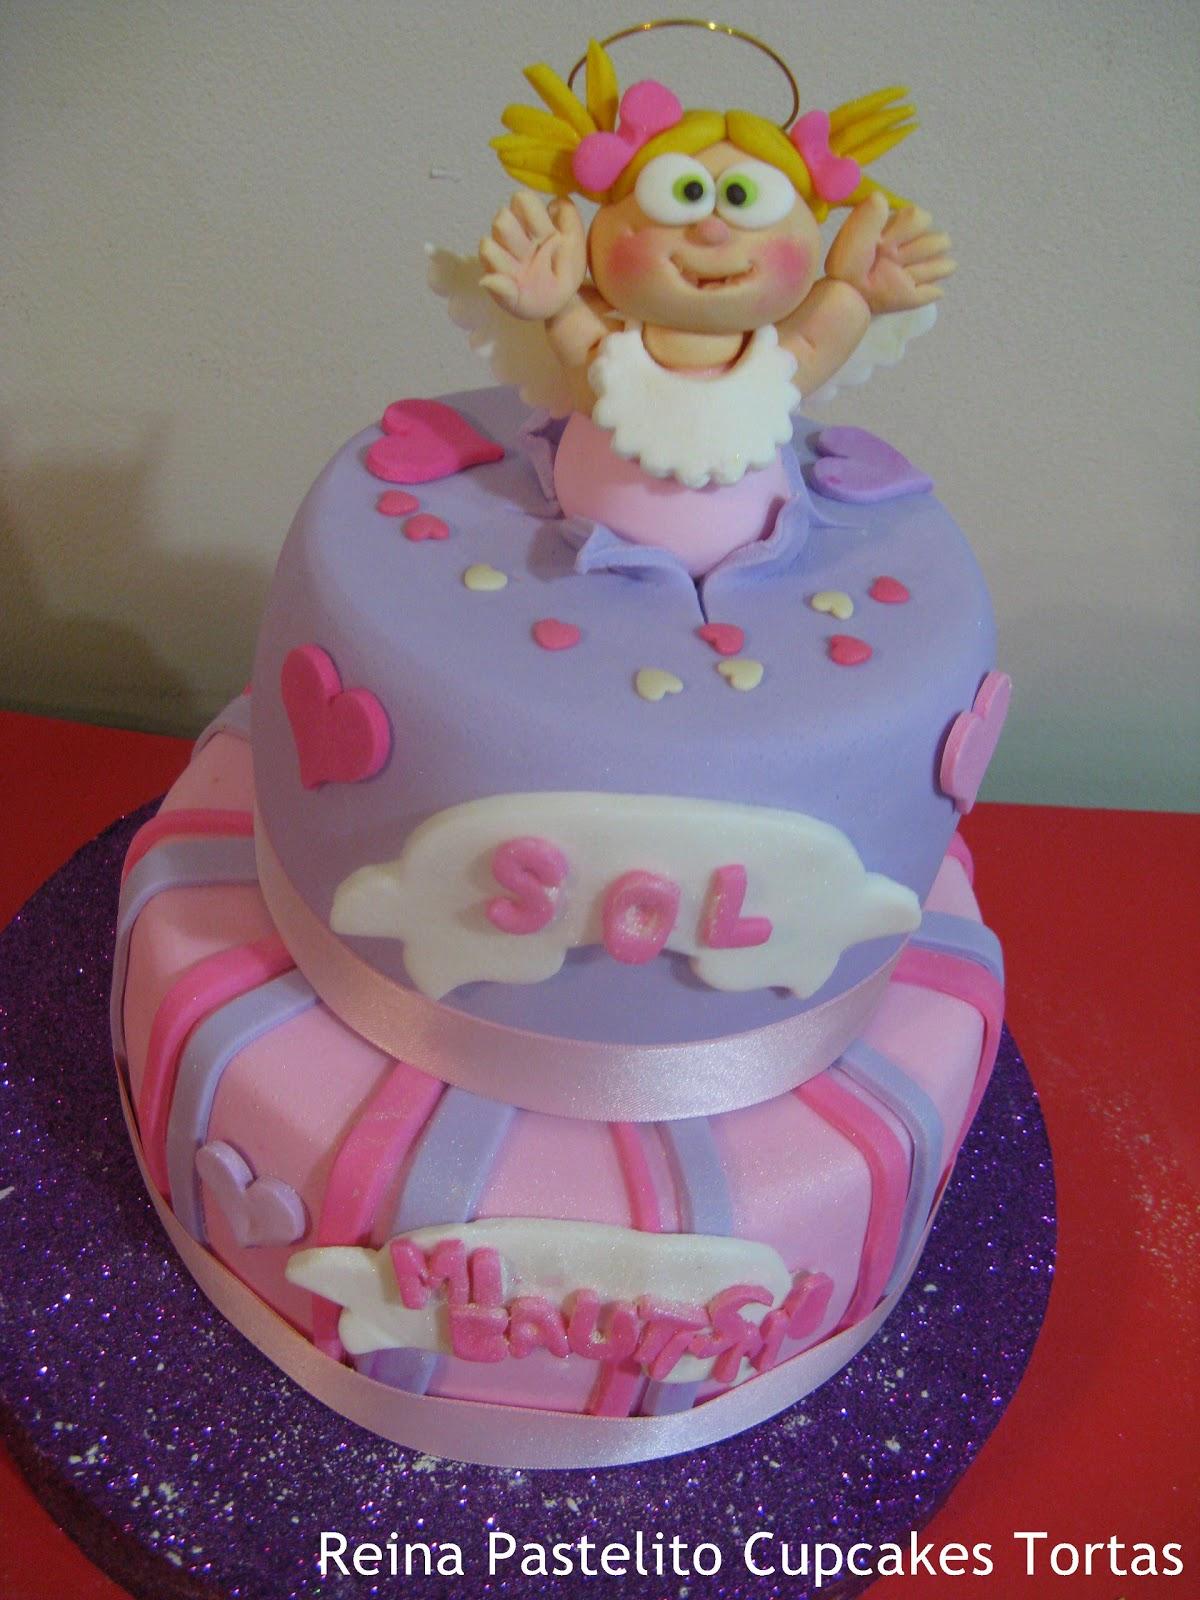 Bautismo Decoracion Nena ~   Tortas Torta de Bautismo Nena, Cupcakes, galletas decoradas Bautismo